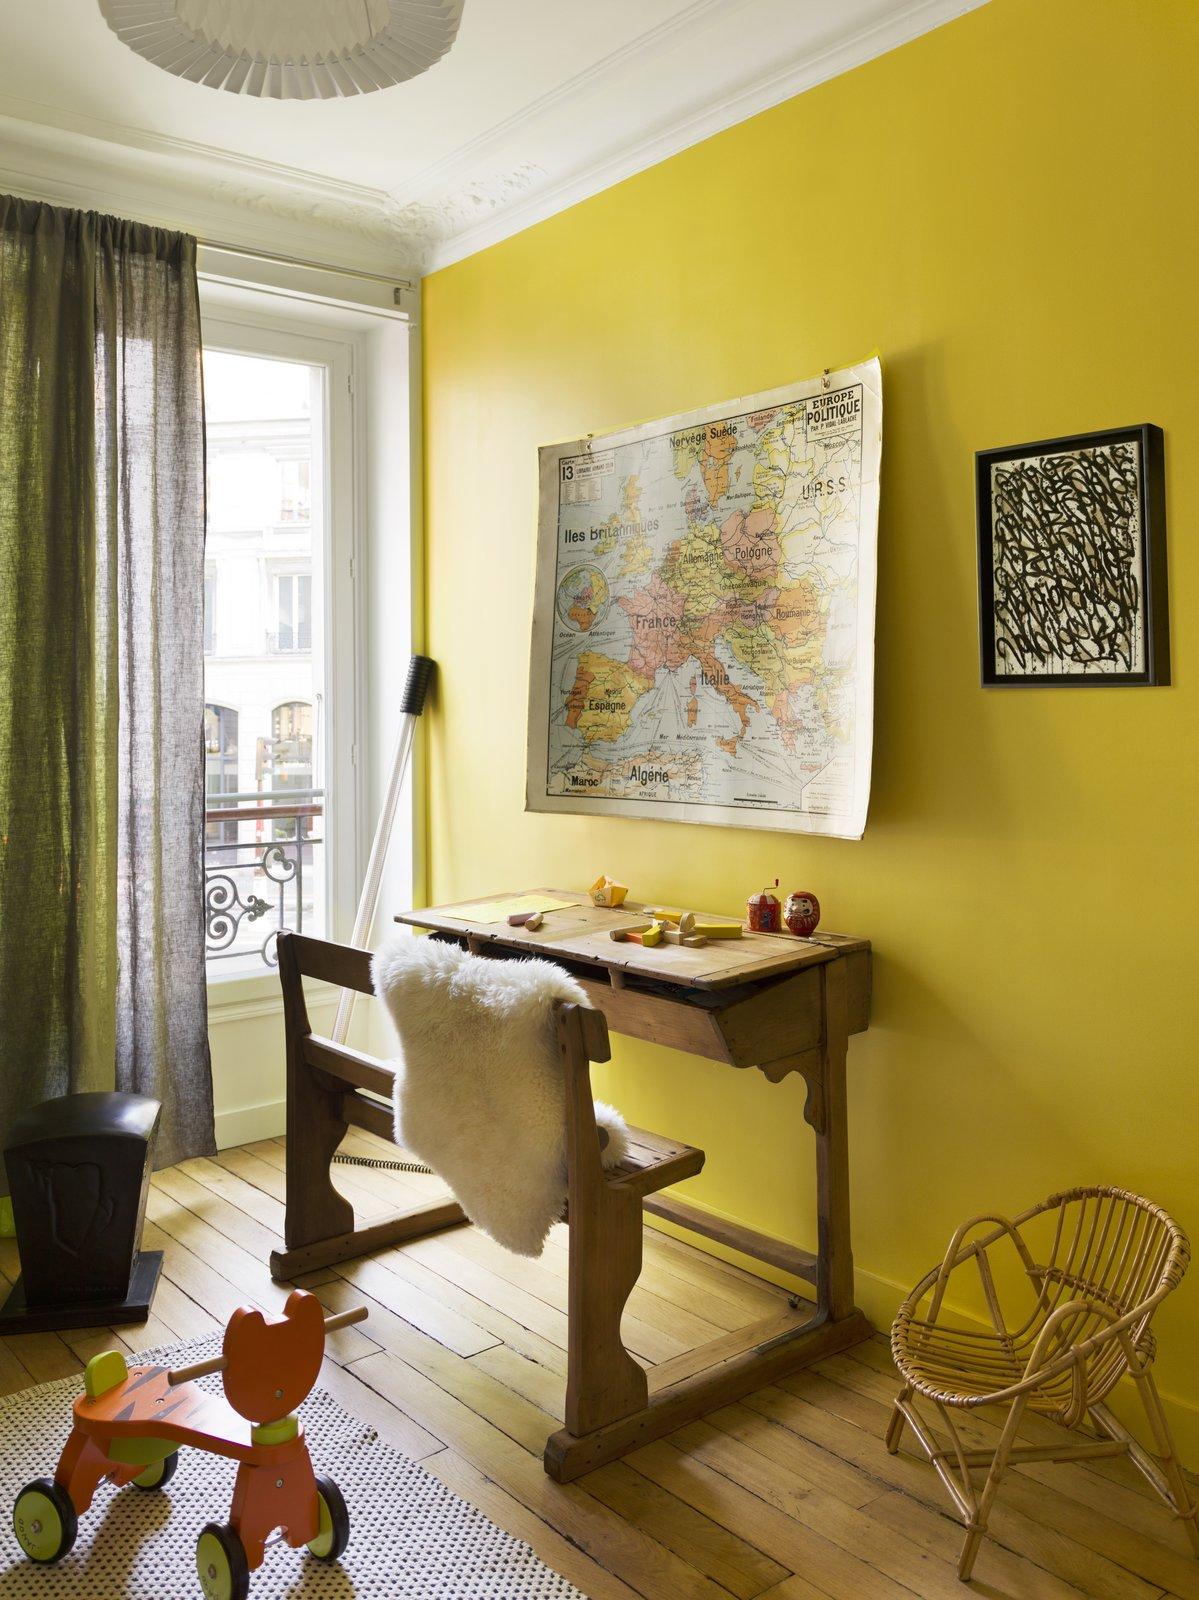 Kids Room, Playroom Room Type, Medium Hardwood Floor, Rug Floor, Chair, Neutral Gender, Toddler Age, and Desk  Photo 10 of 12 in Street Art Meets Vintage Pieces in a Chic Parisian Renovation